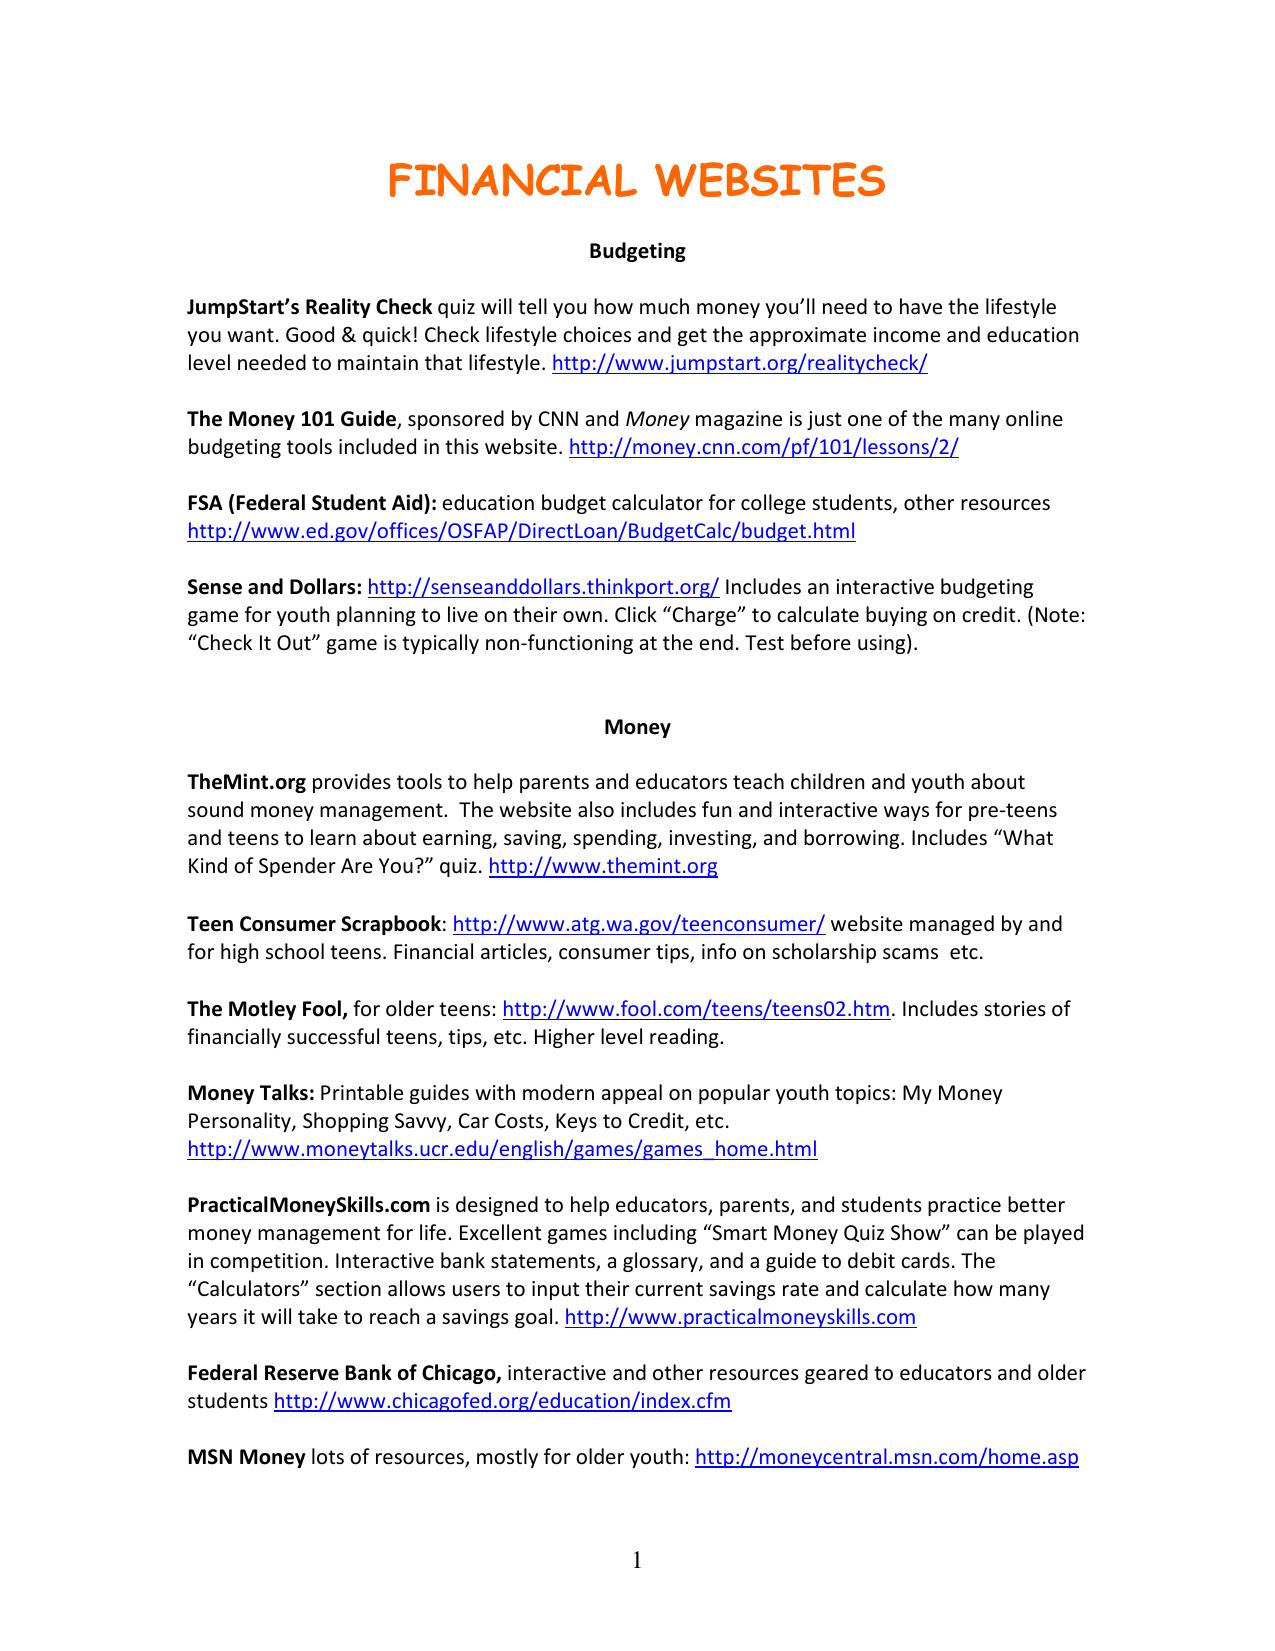 image regarding Money Personality Quiz Printable identified as Fiscal Sites